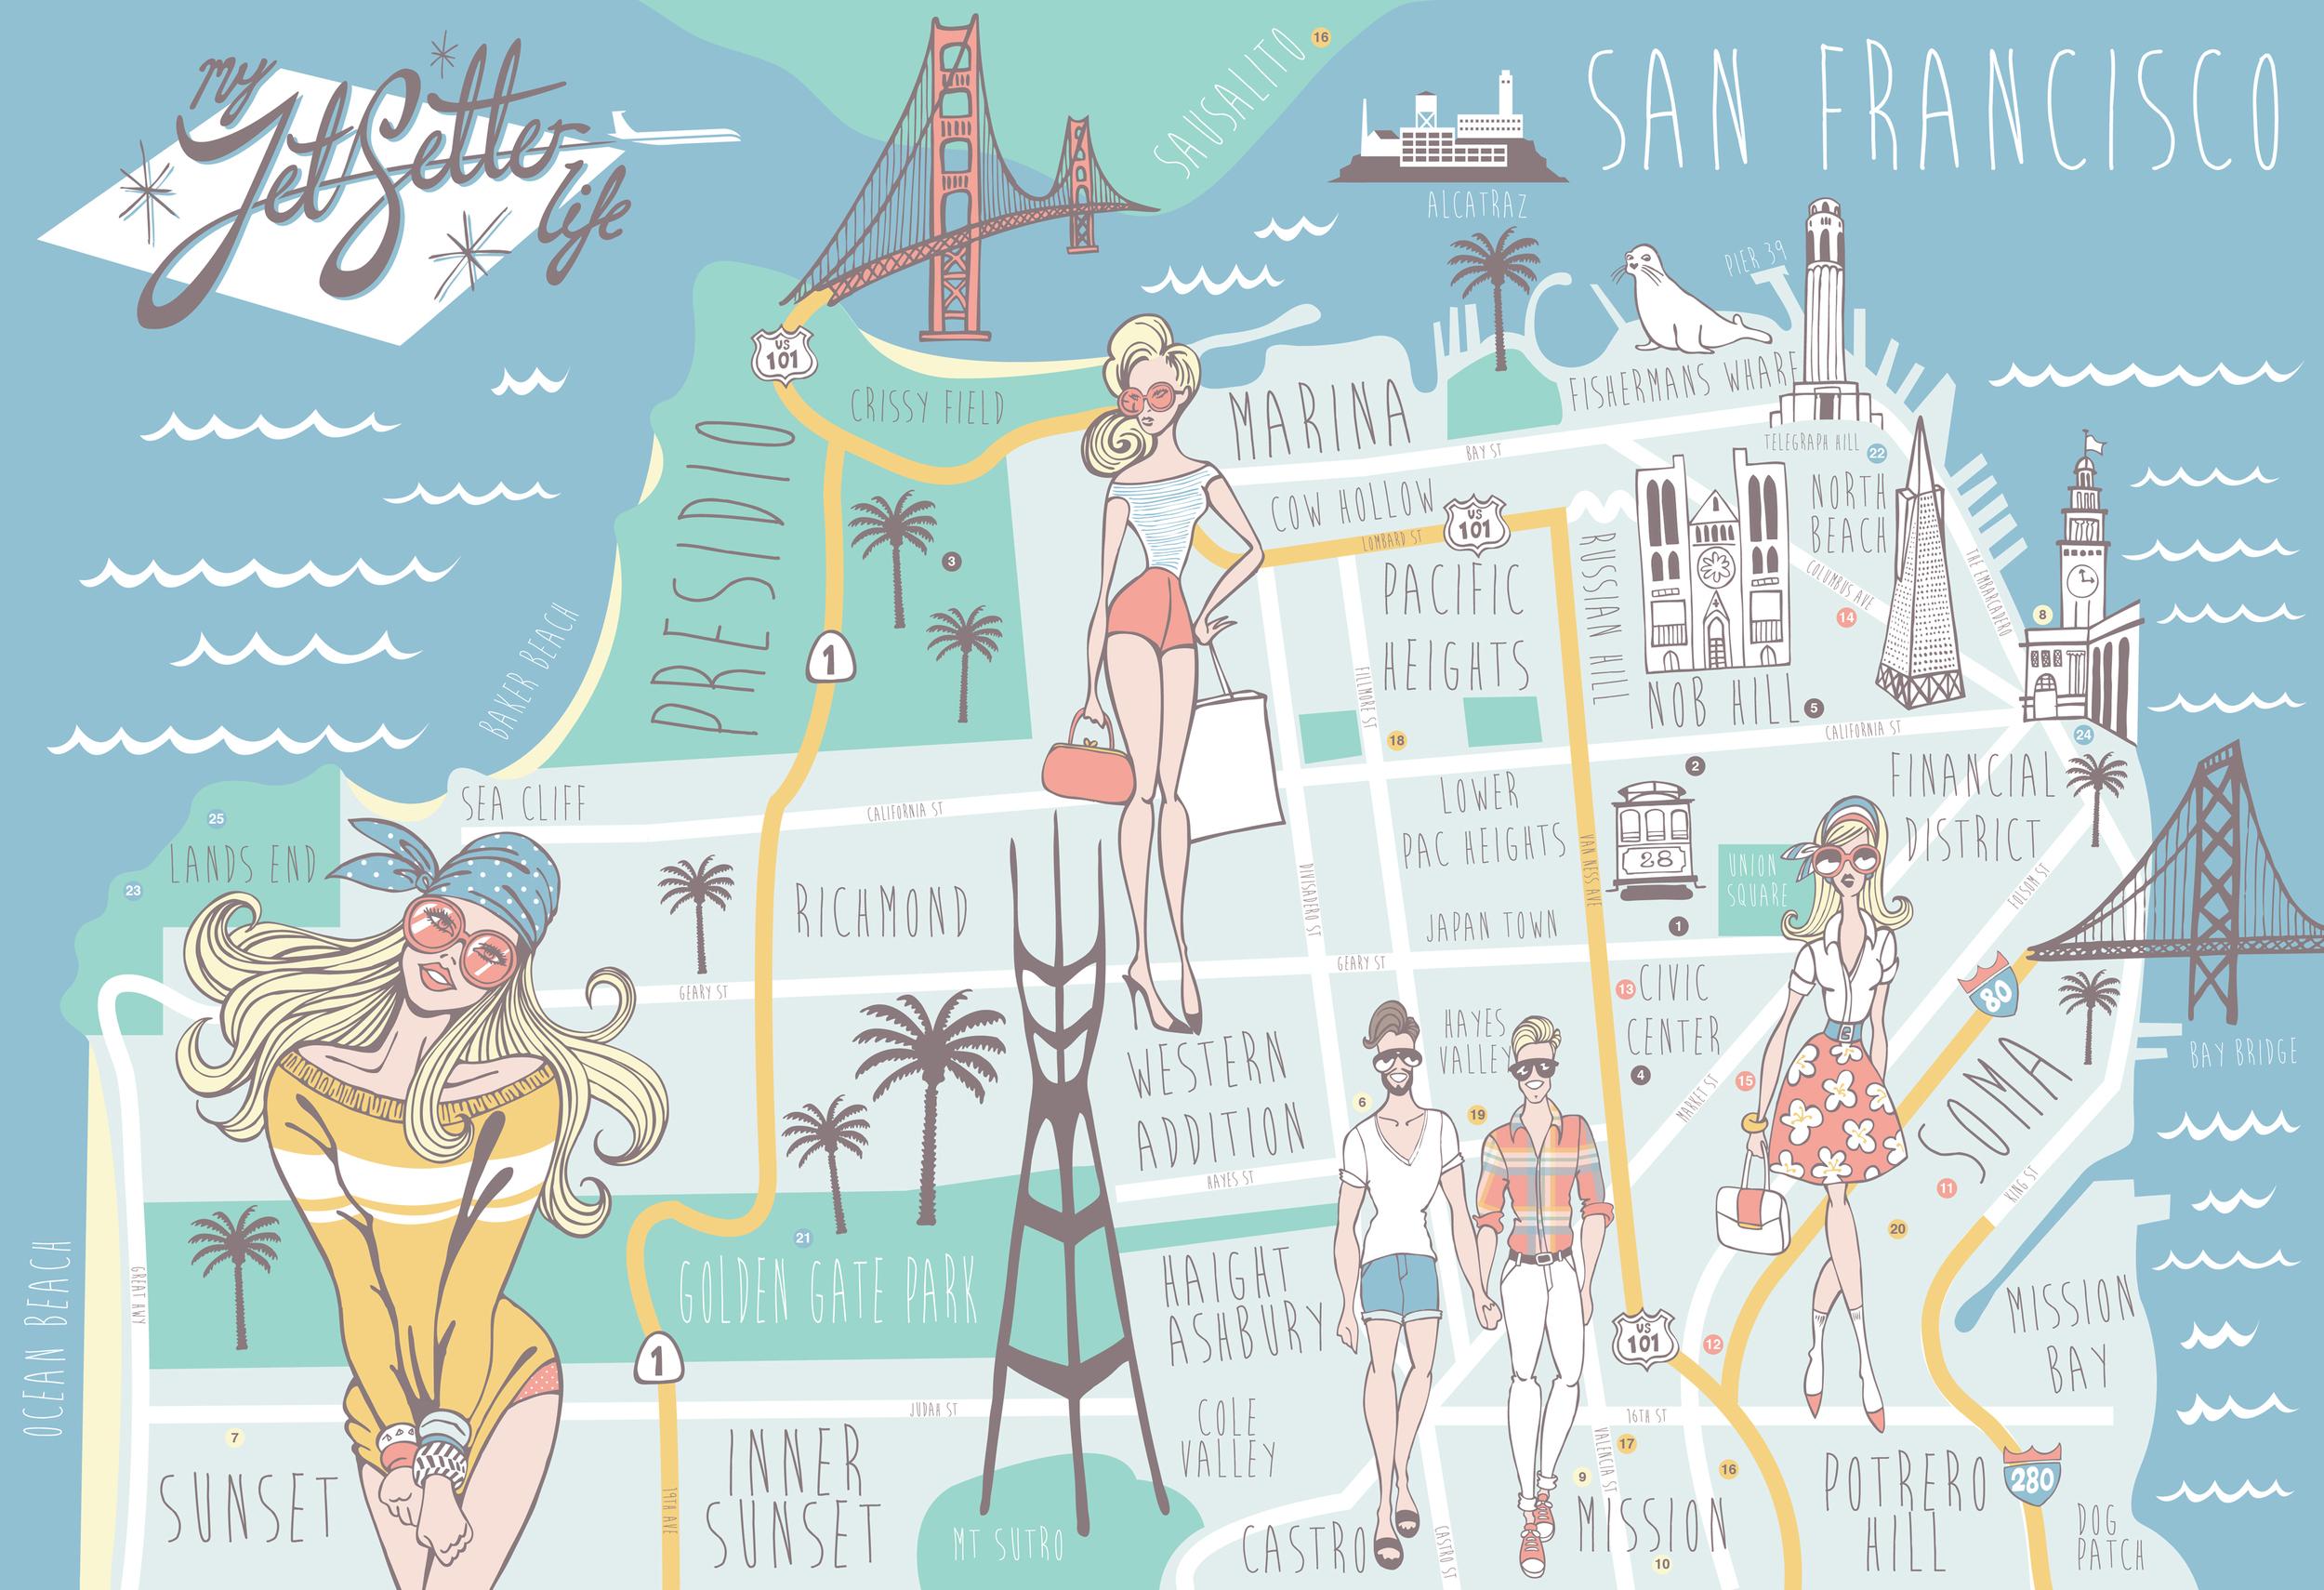 MY_JETSETTERLIFE_SAN_FRANCISCO_MAP